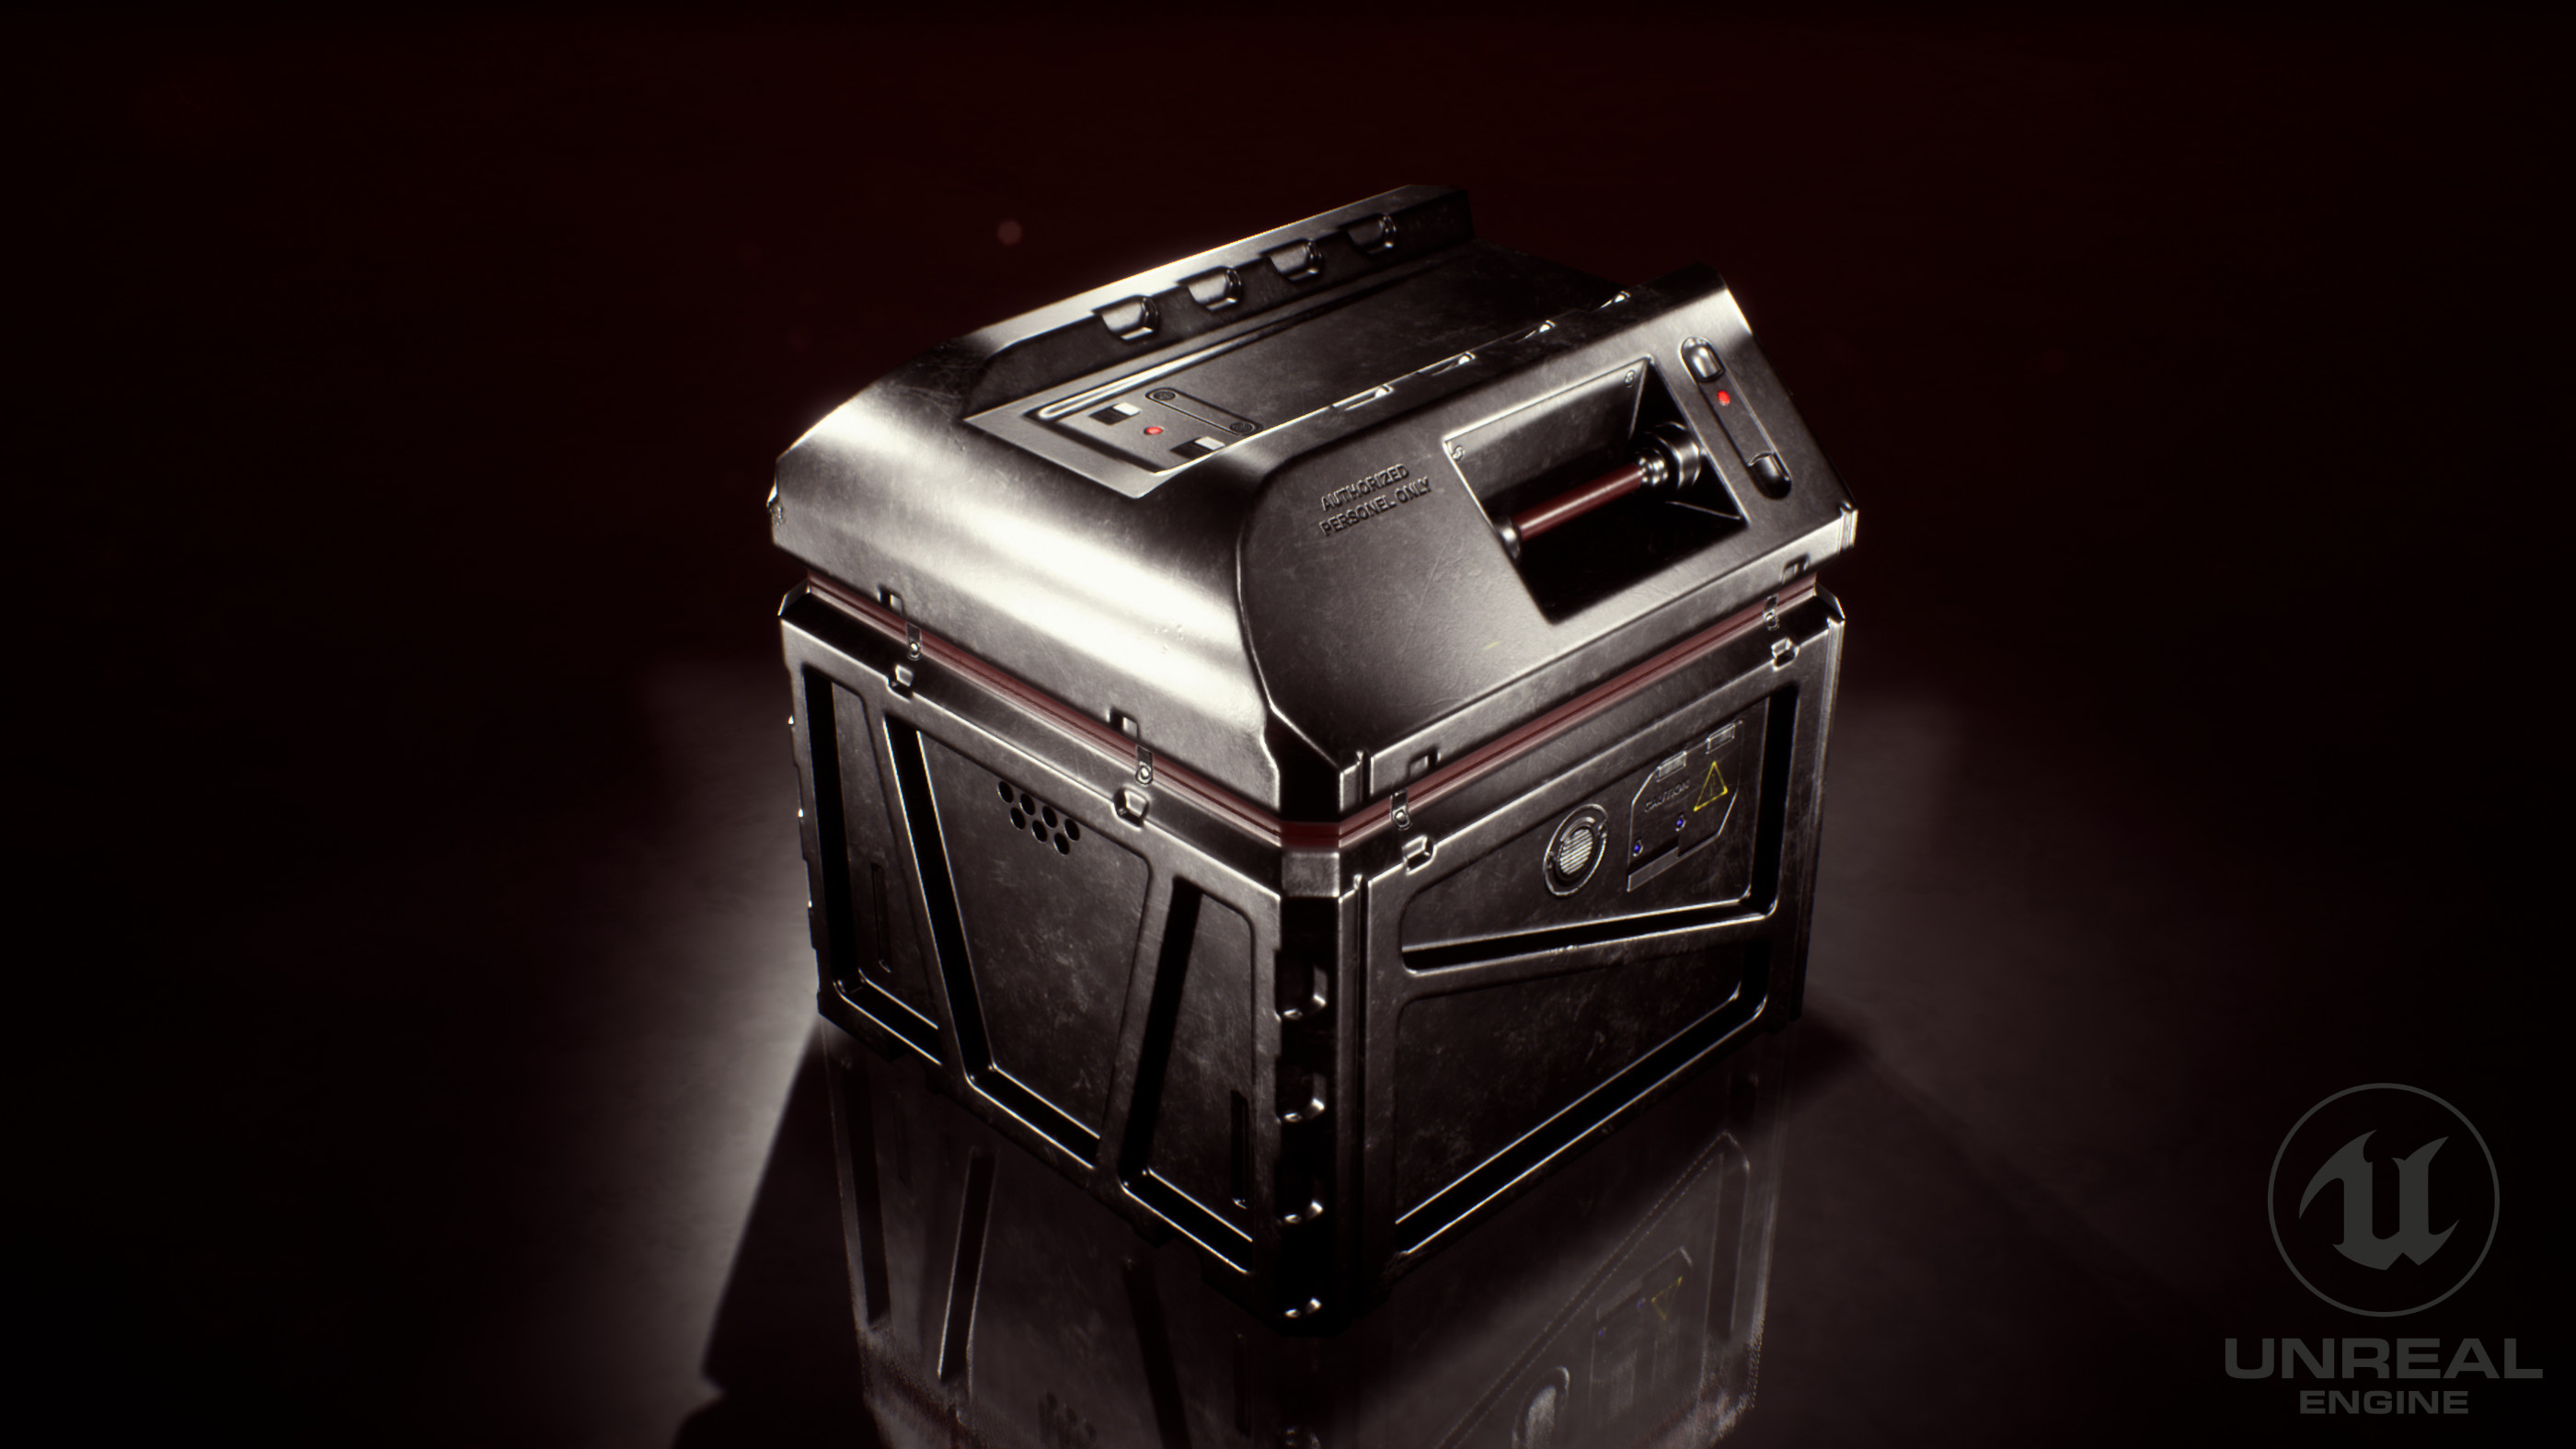 Unreal Engine 4 Render - Front